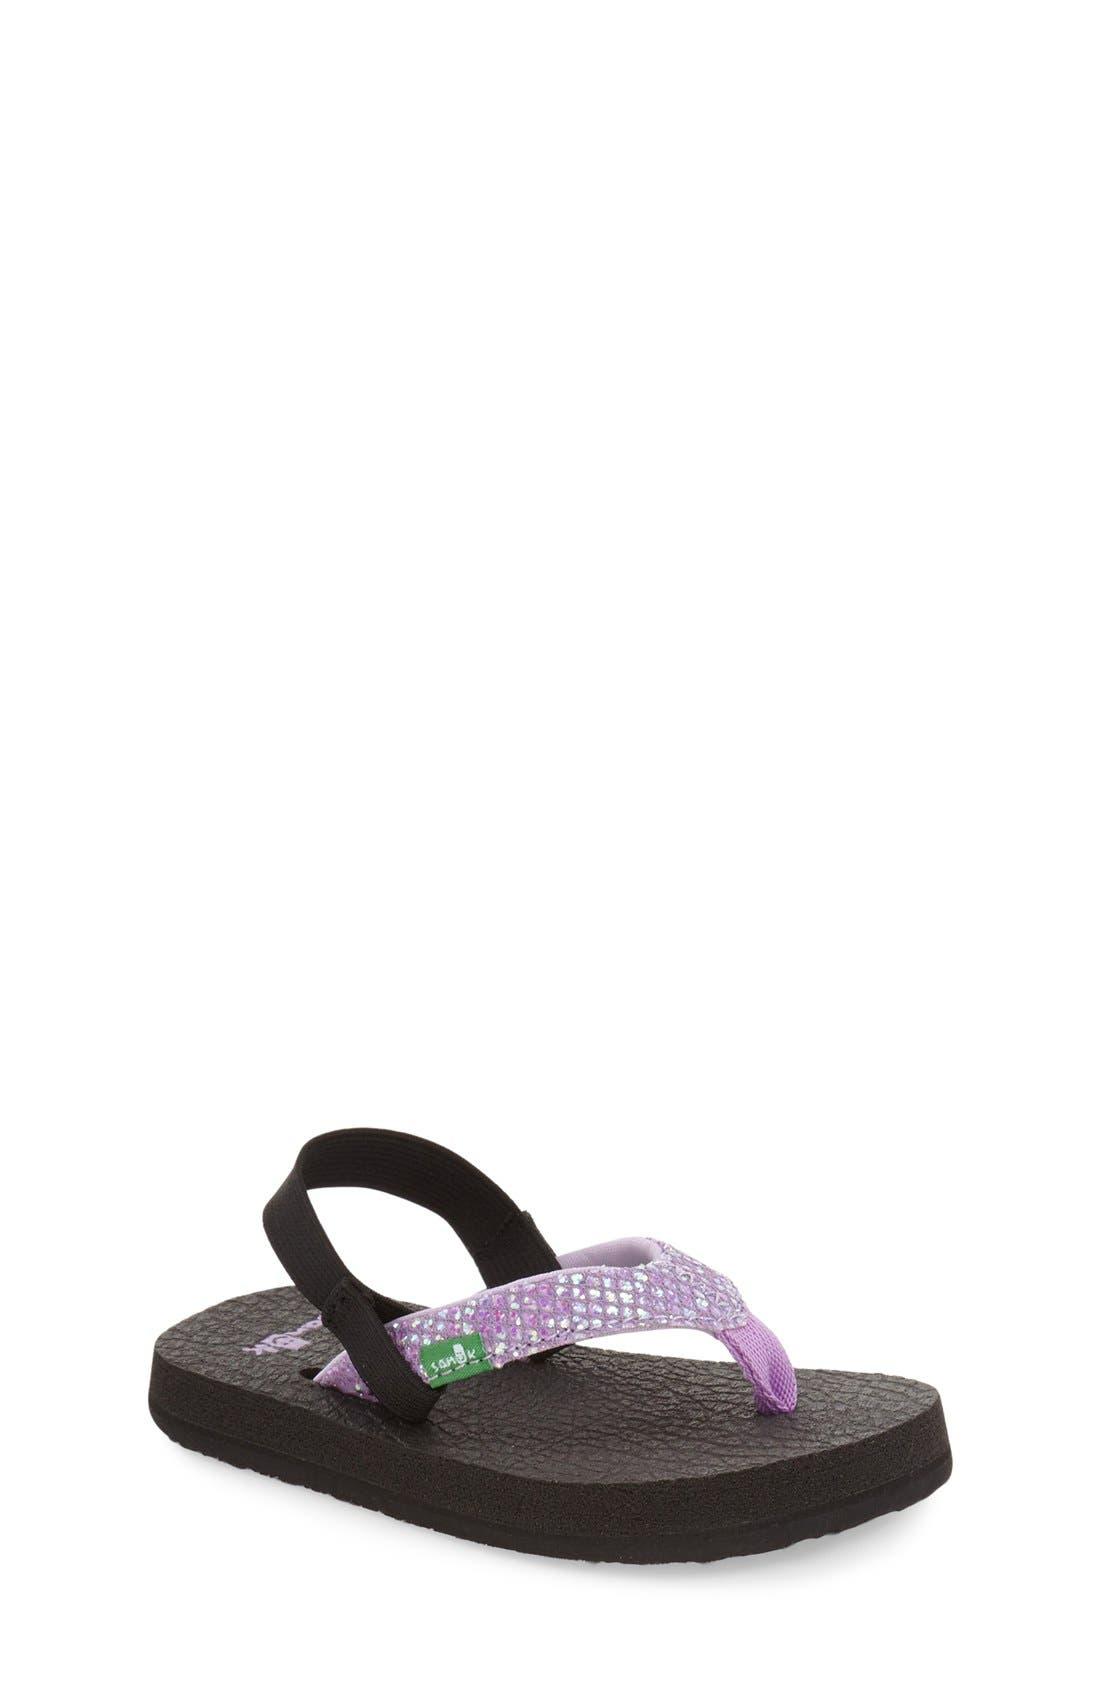 SANUK Yoga Glitter Sandal